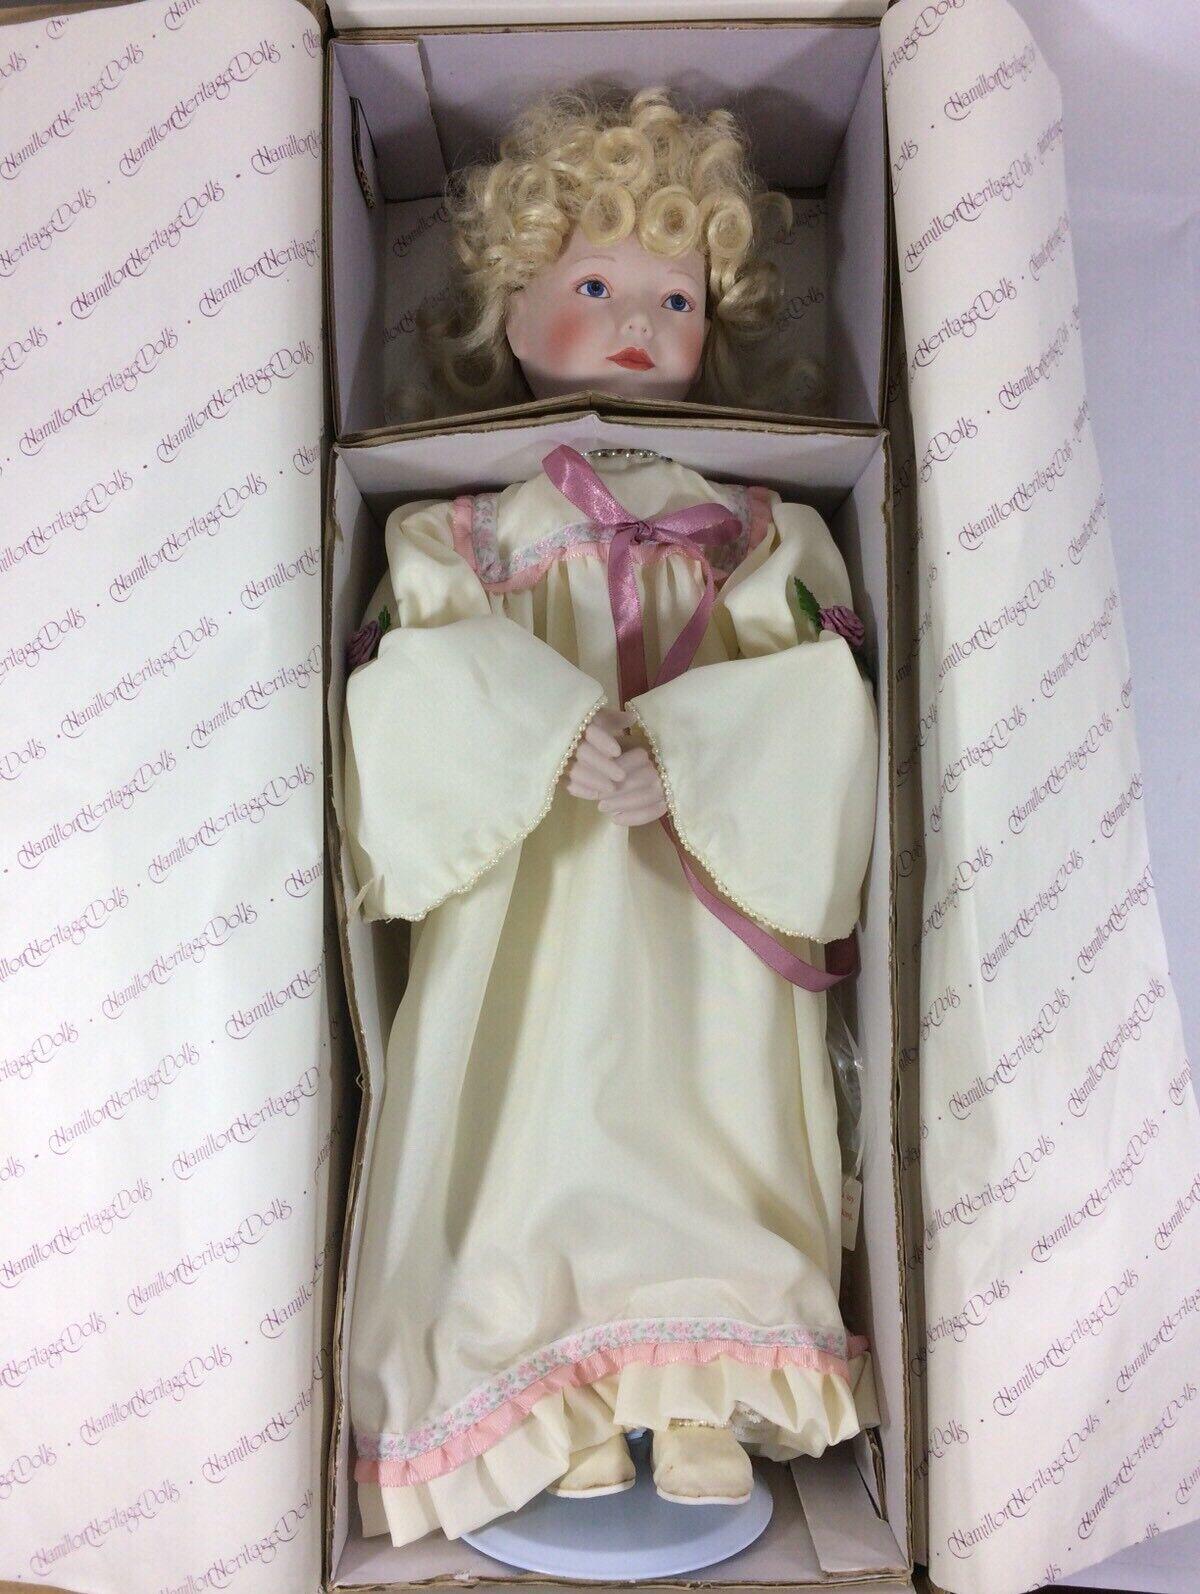 Hamilton Heritage A Gilt Of Beauty - Cyrus Porcelain Doll 1992